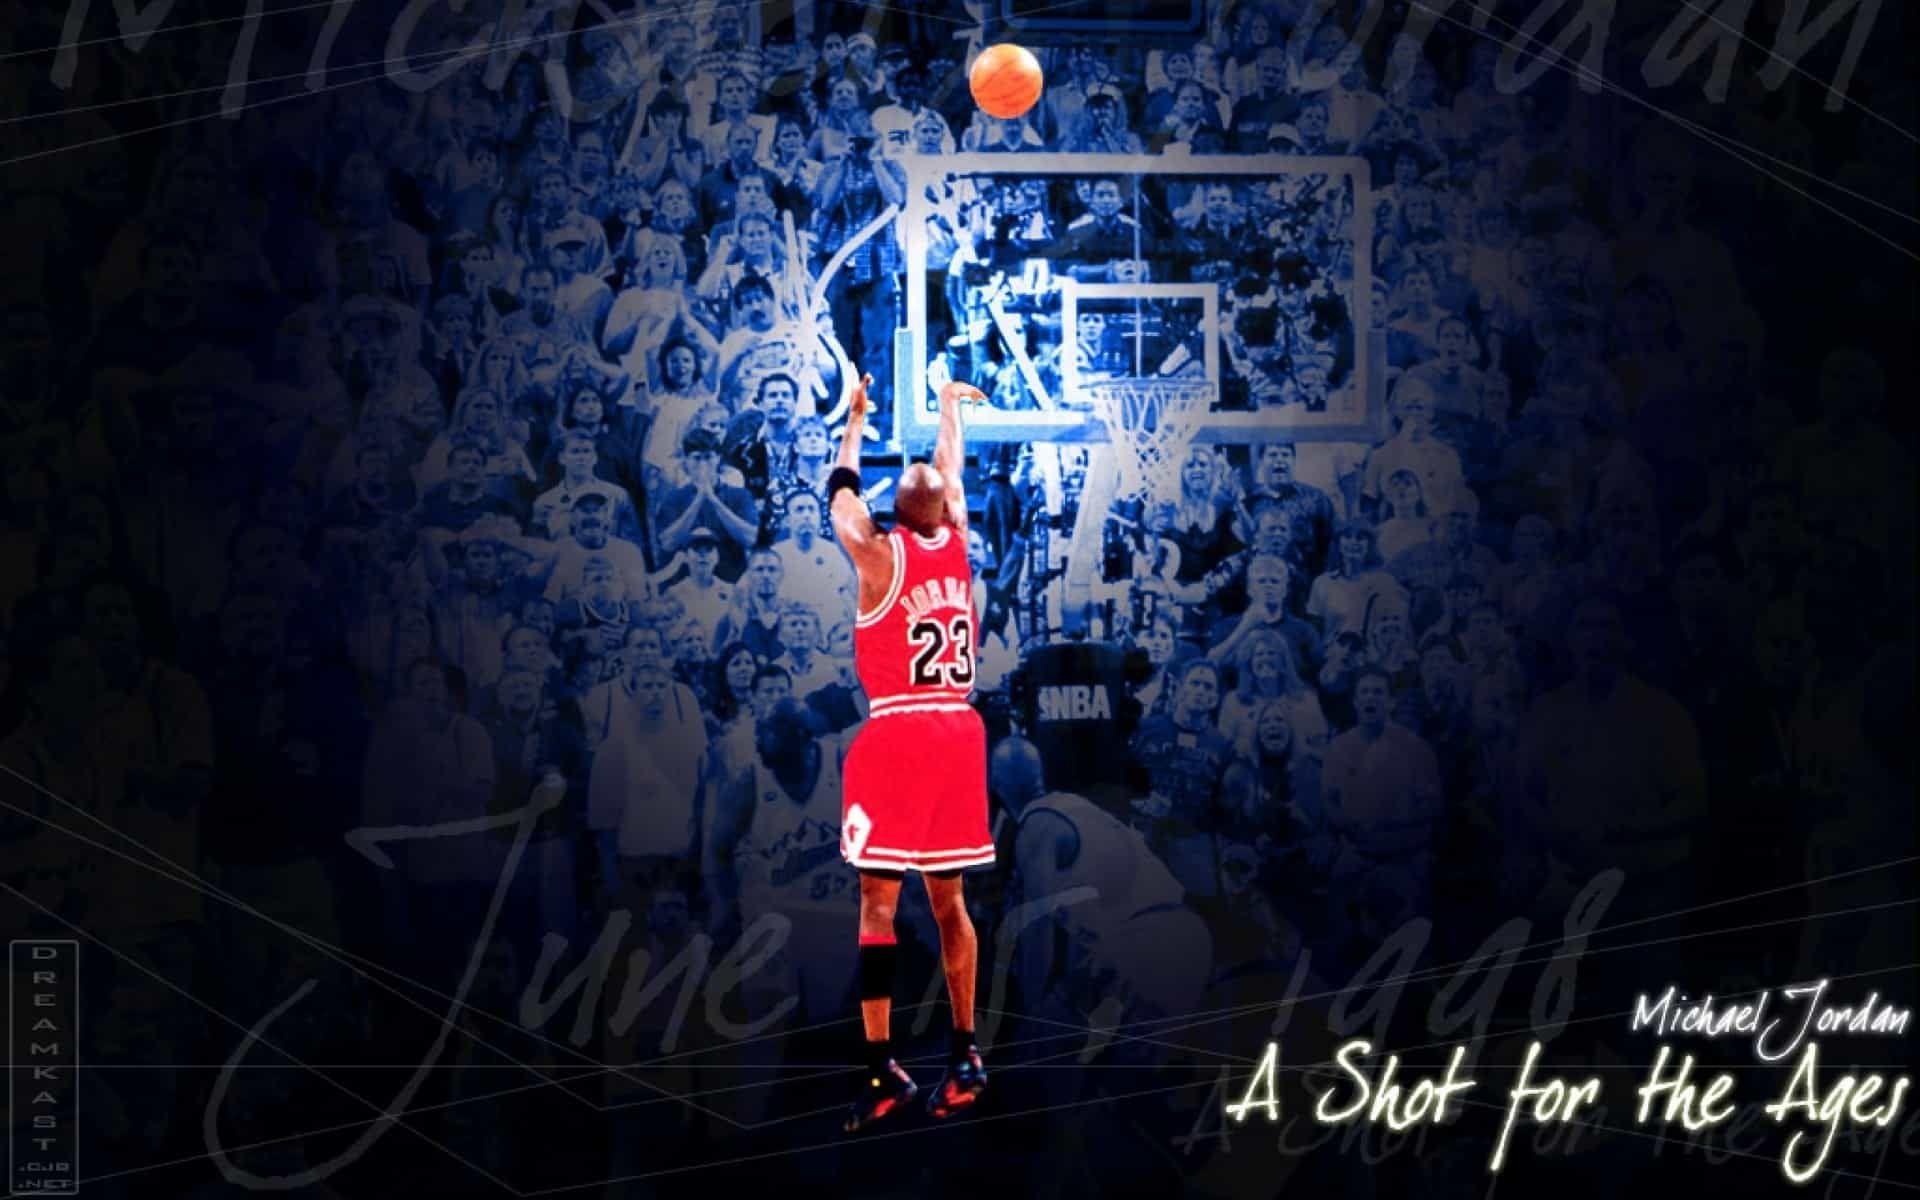 Cool Michael Jordan Wallpapers Http Jazzwallpaper Com Cool Michael Jordan Wallpapers Hd Wallpa Sports Wallpapers Chicago Bulls Wallpaper Jordan Background